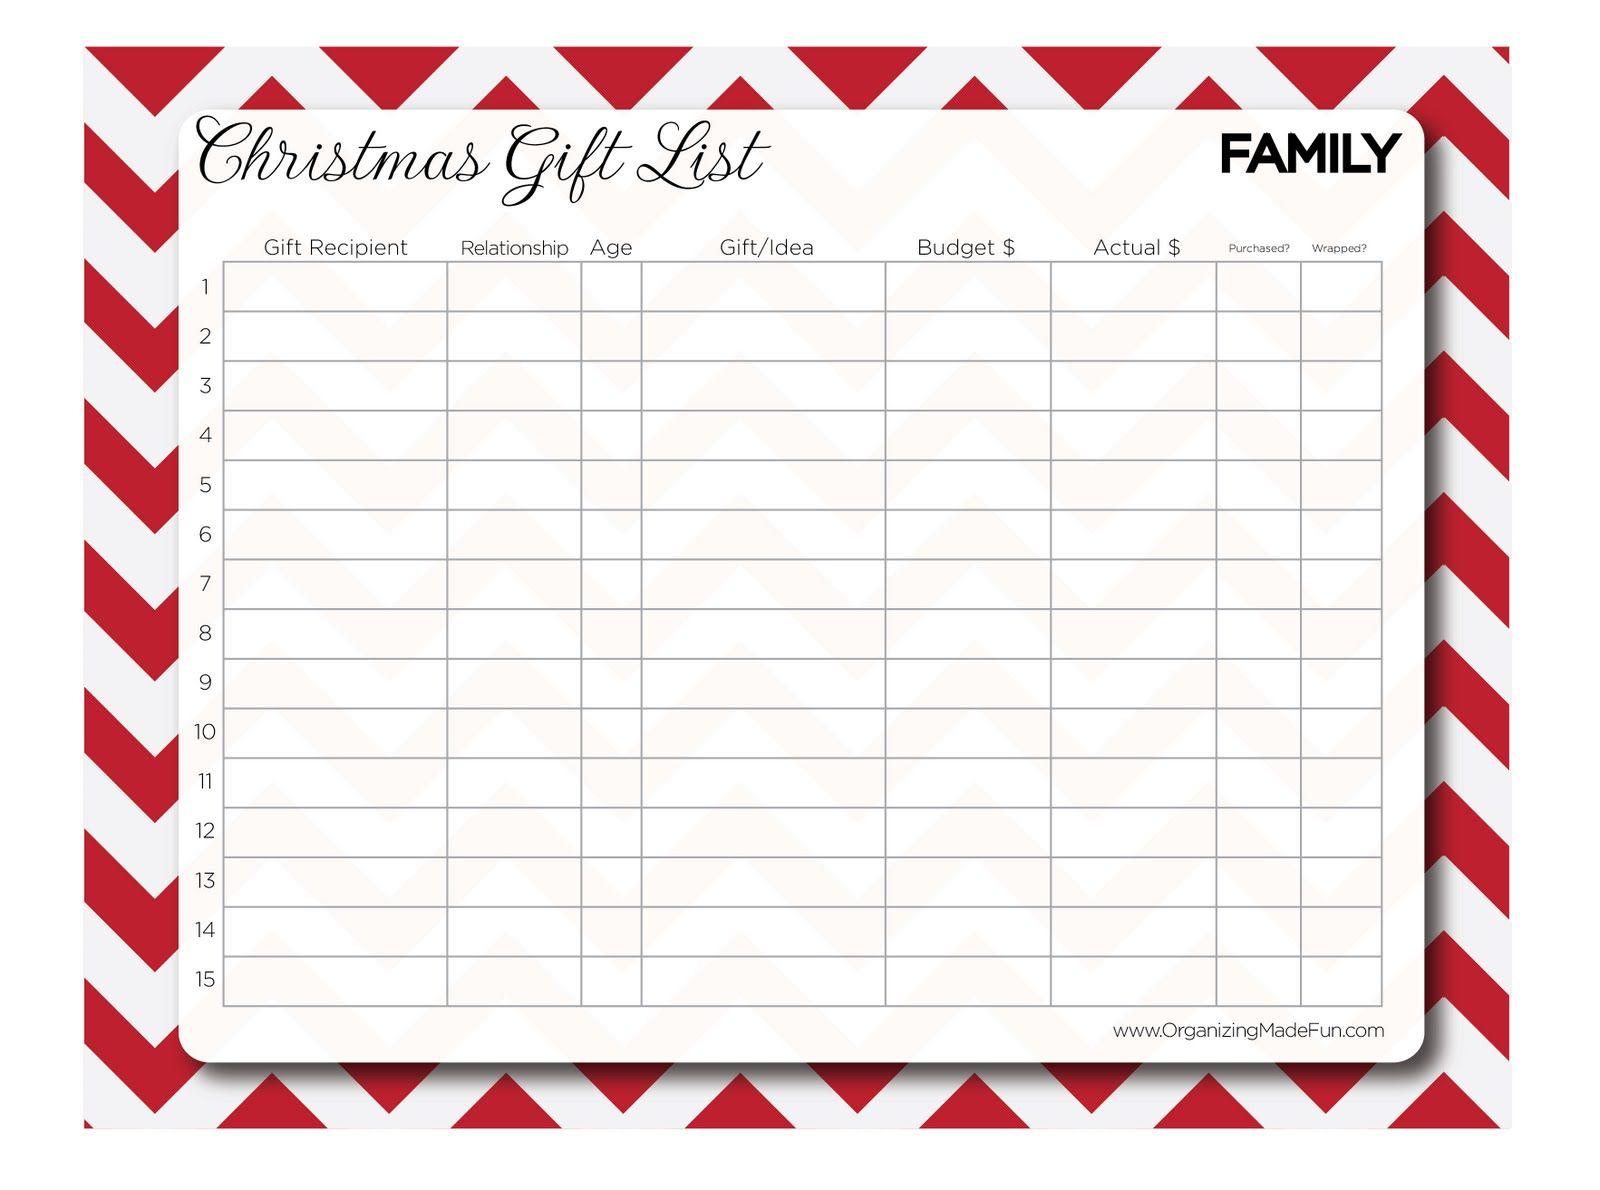 FAMILYChristmas List Organizer.jpg   Google Drive   Christmas list ...